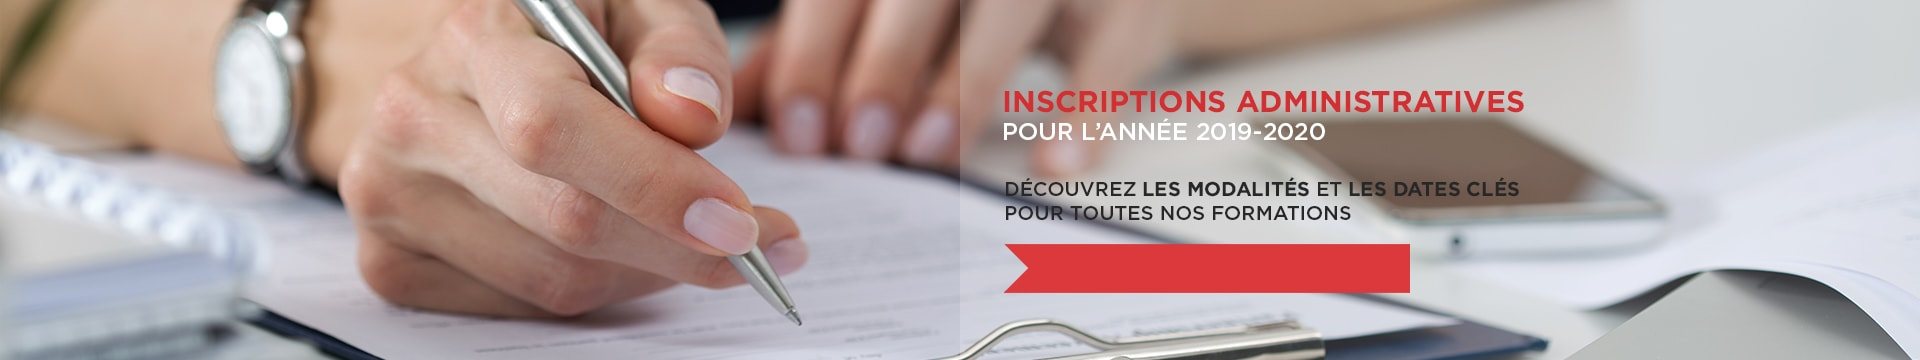 Inscriptions Administratives 2019-2020 - Montpellier Management